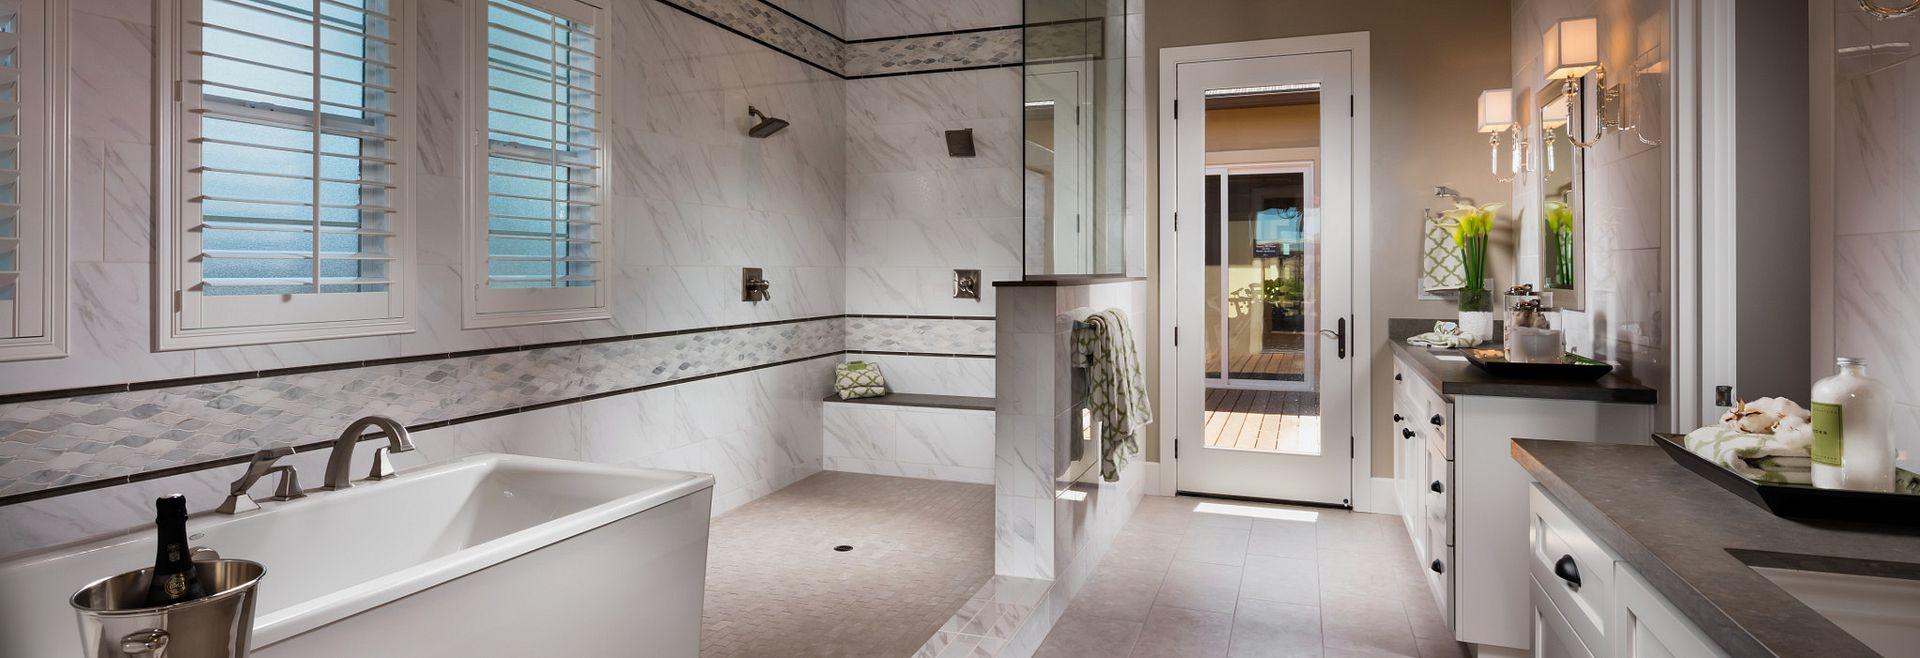 Vista Dorado Plan 3 Brentwood Spa-Style Master Bath